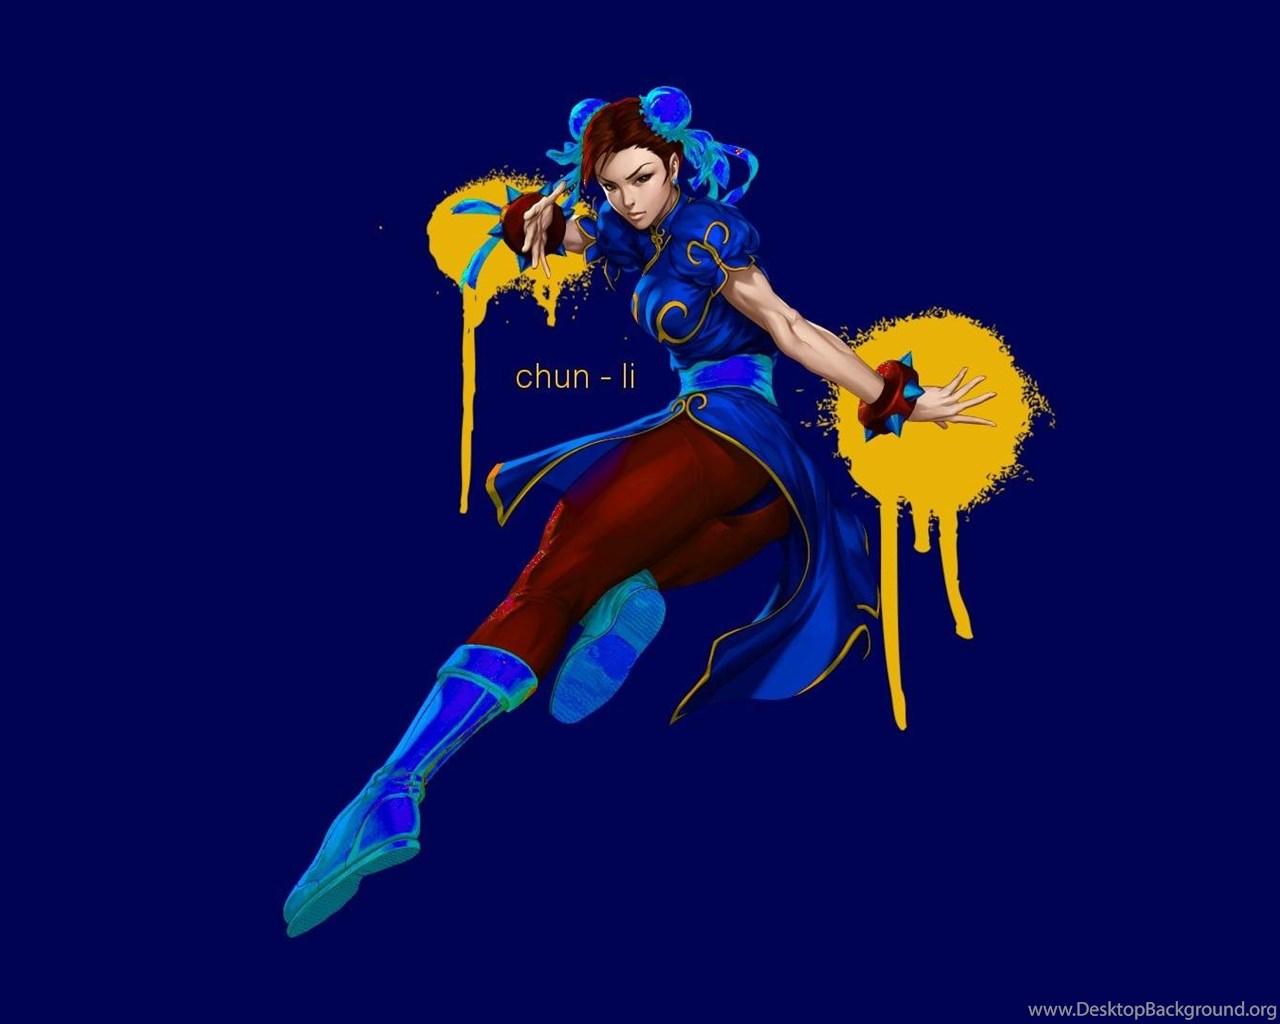 Video Games Street Fighter Chun Li Wallpapers Desktop Background